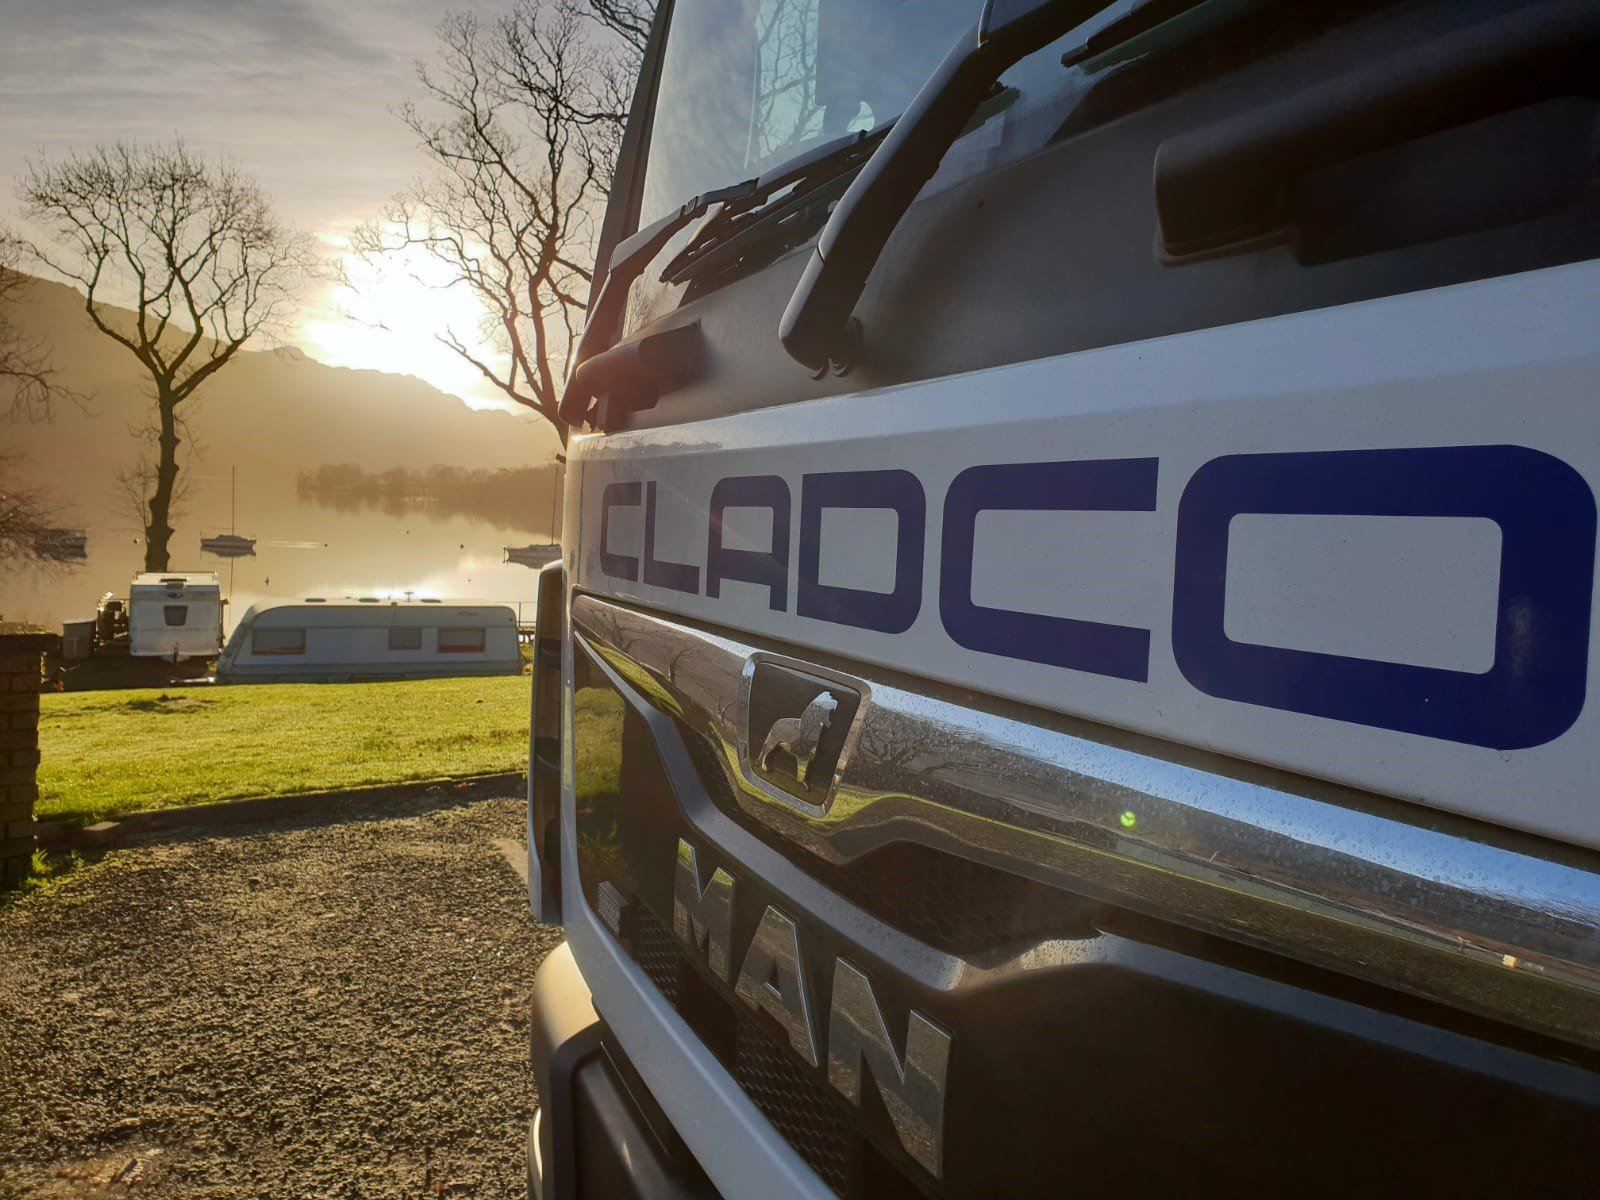 Cladco Lorries deliveries across the UK